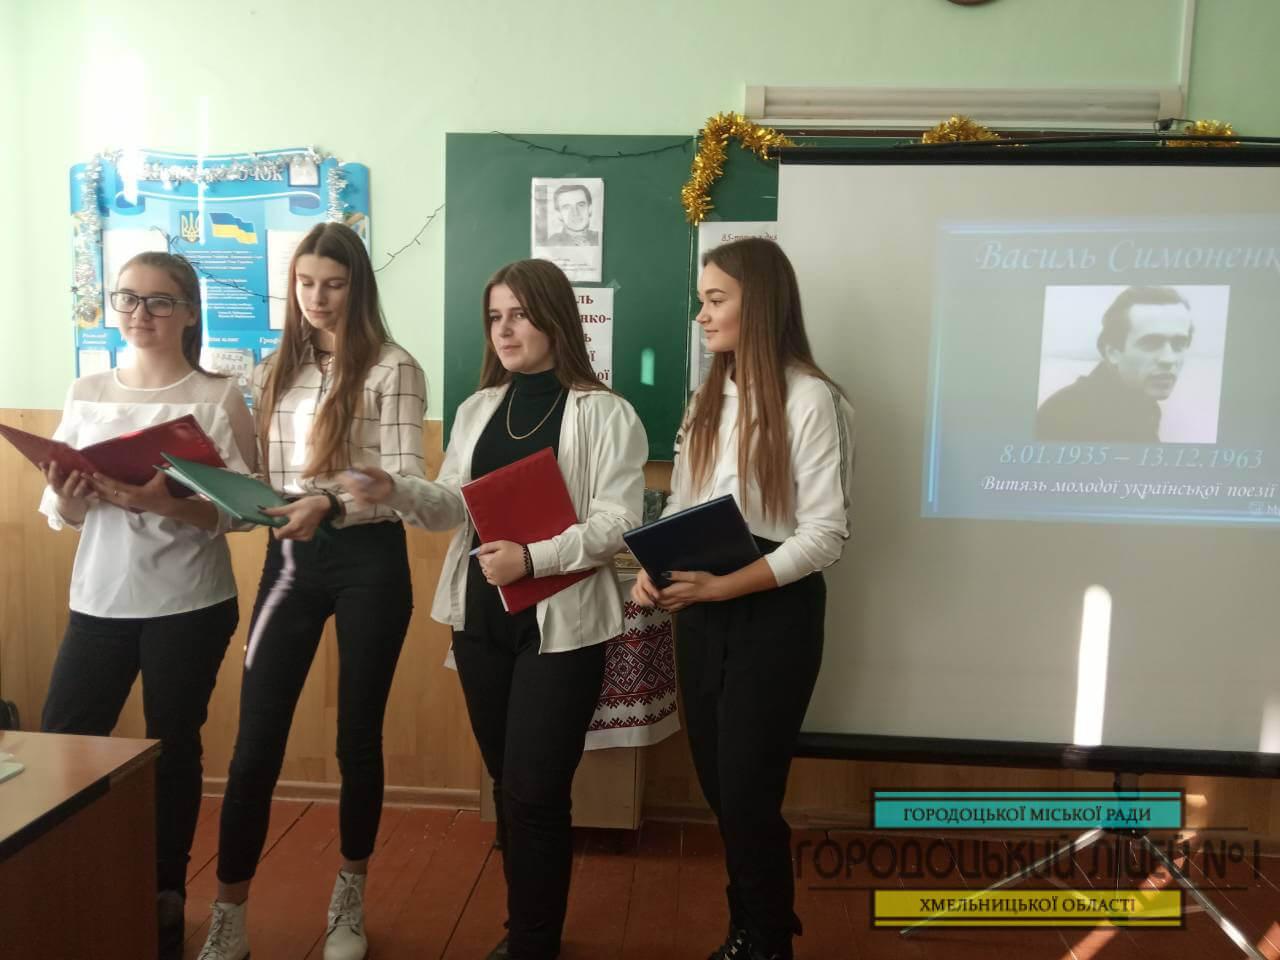 zobrazhennya viber 2020 01 20 10 06 572 - «Василь Симоненко – витязь молодої української поезії»